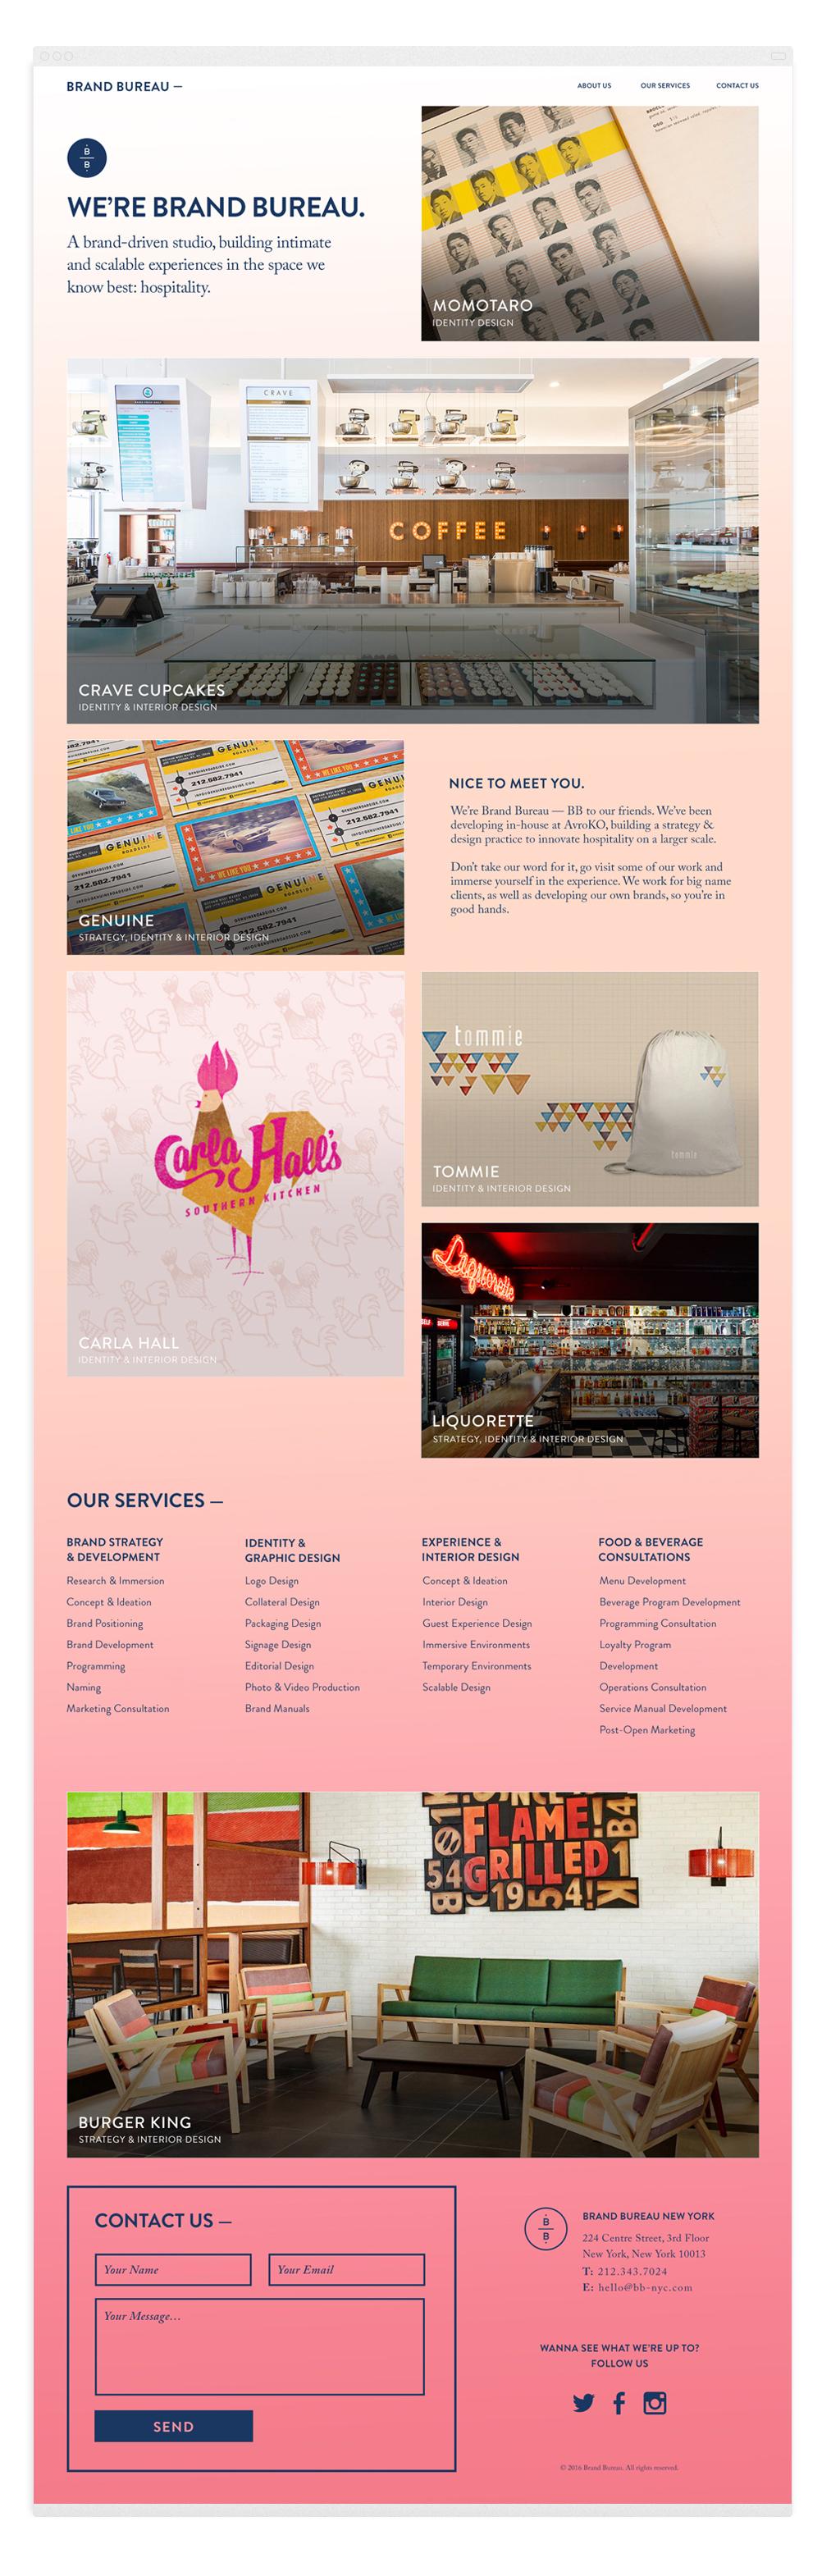 zmaic-bb-brand-bureau_responsive-website-strategy-homepage-desktop.jpg